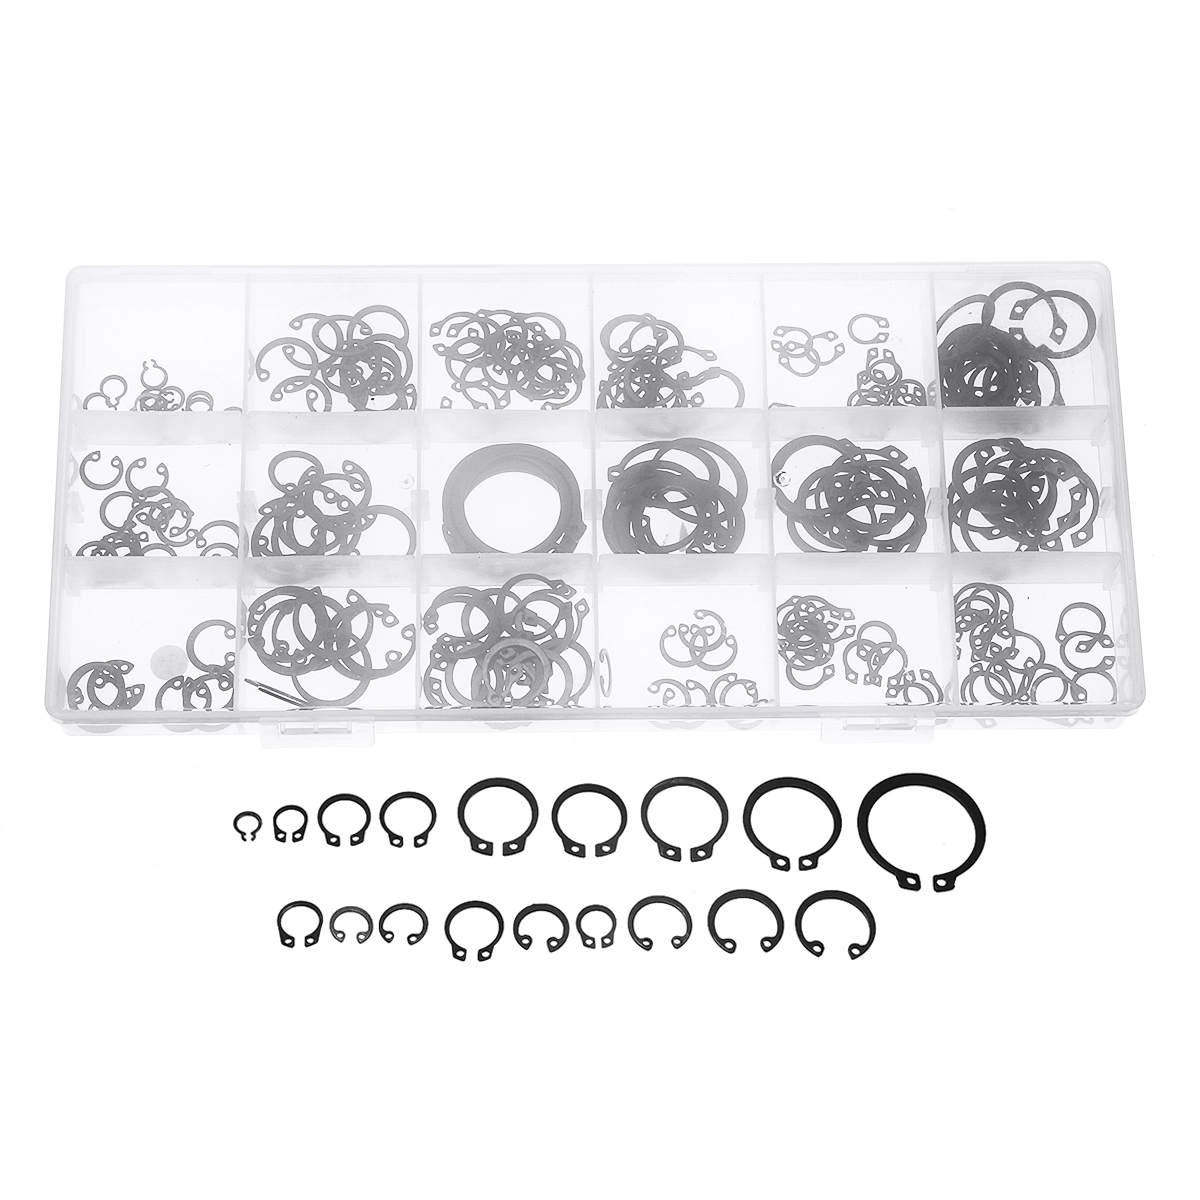 225x Steel External Circlip Retaining Ring Snap Ring Assortment Kit New